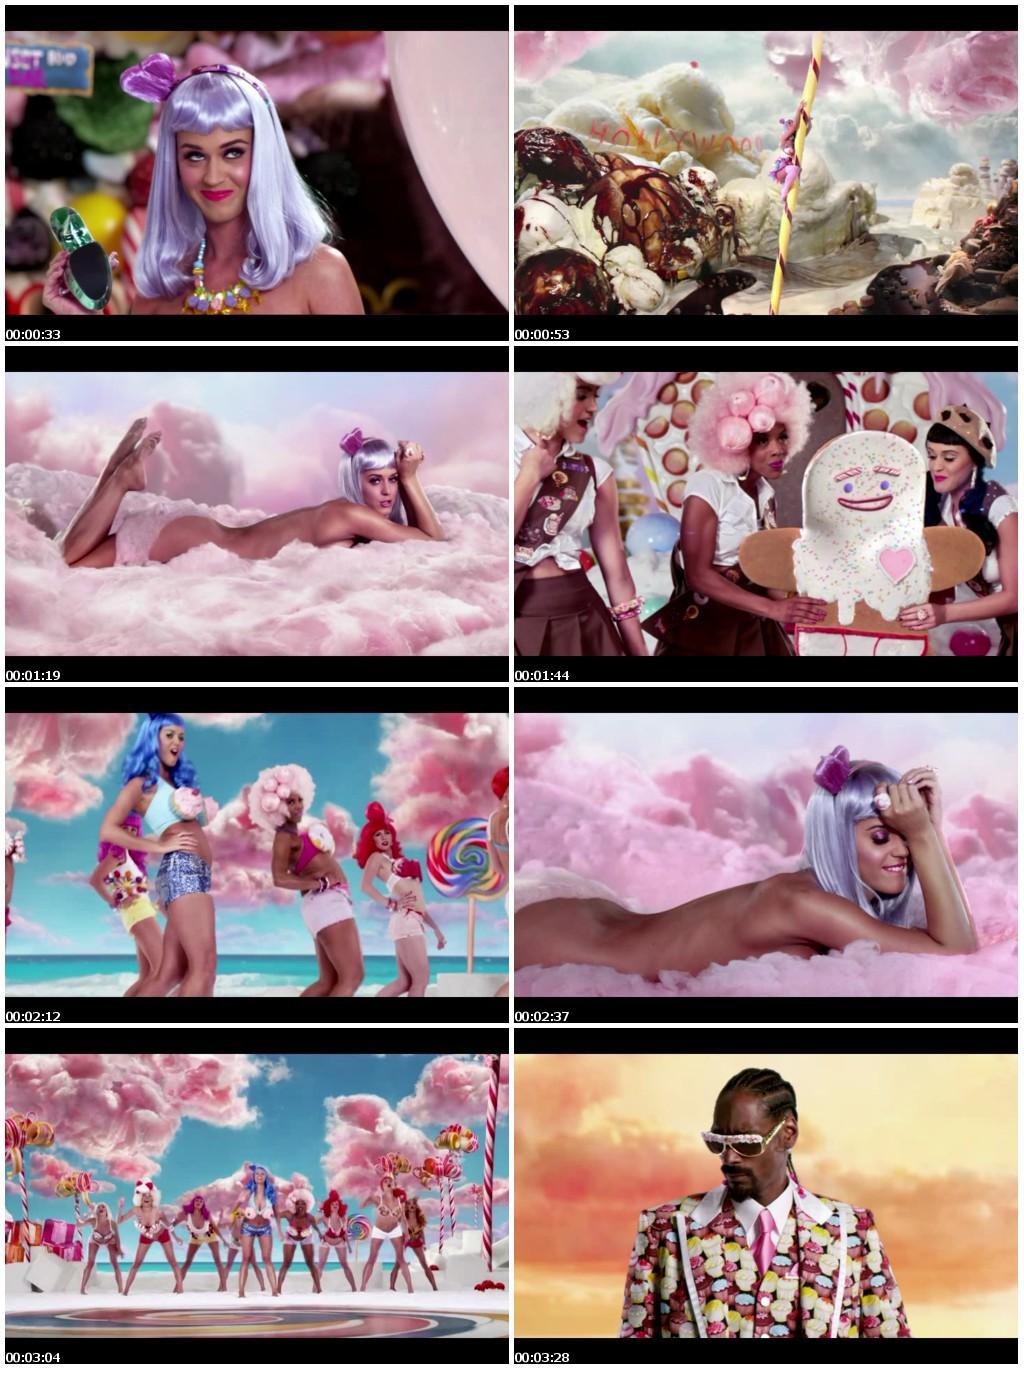 Videoclip California Gurls (ft. Snoop Dogg) - Katy Perry (2010)